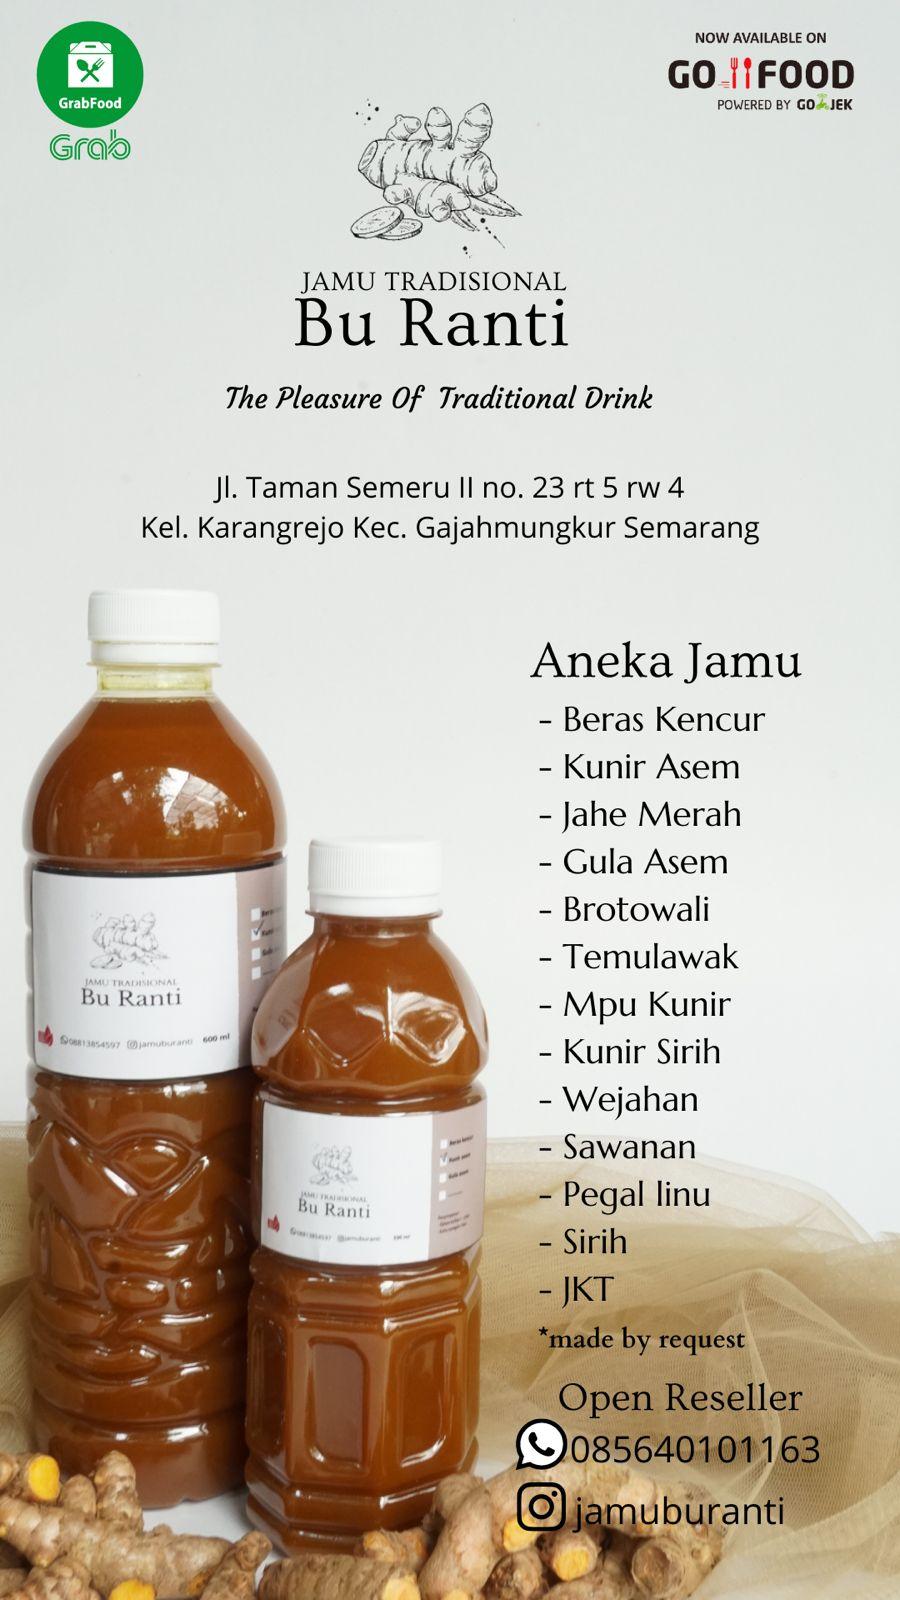 Jamu Made by Request 500 ml